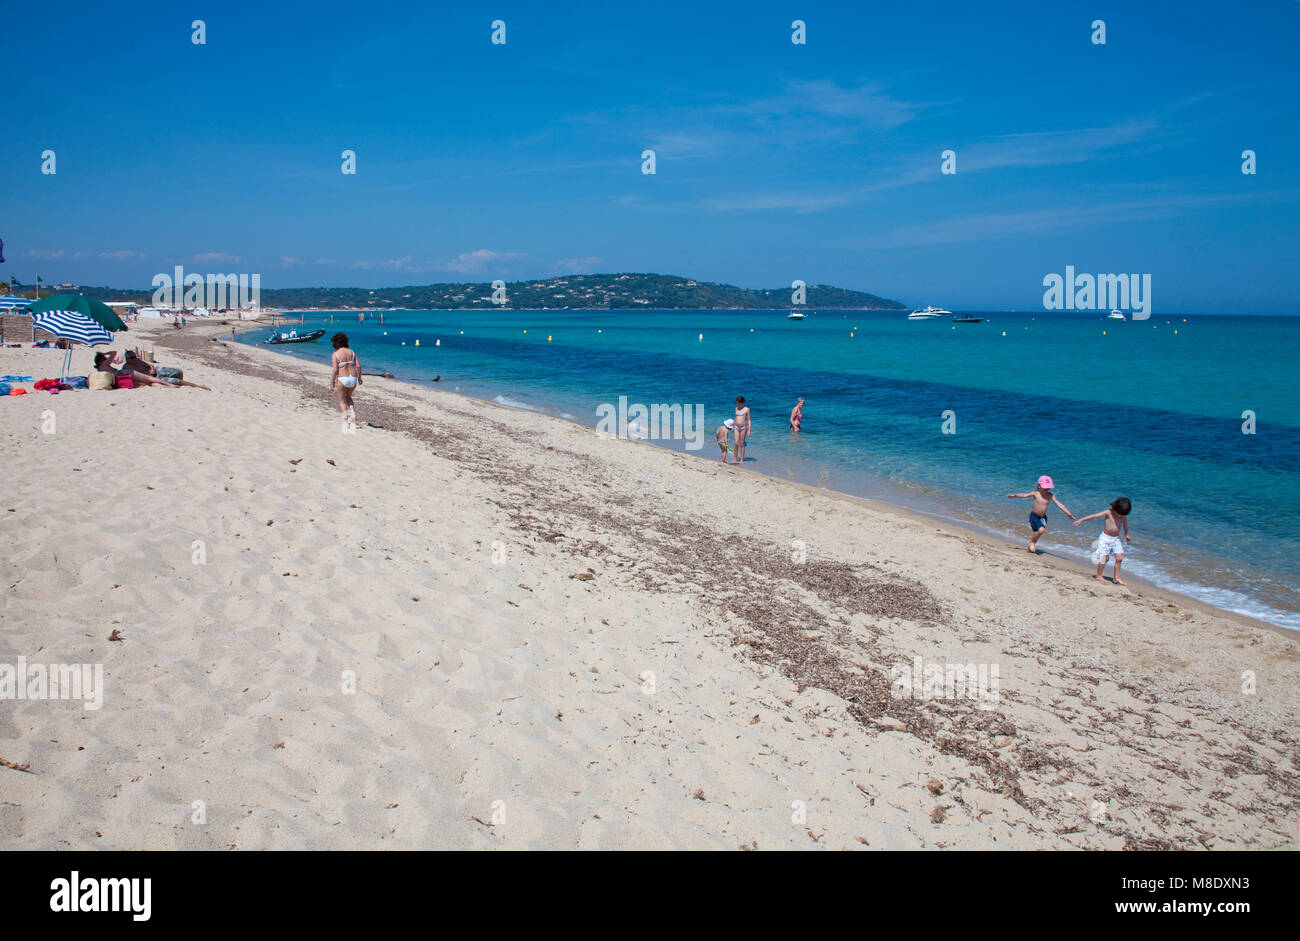 Beach Life At Pampelonne Beach Popular Beach At Saint Tropez